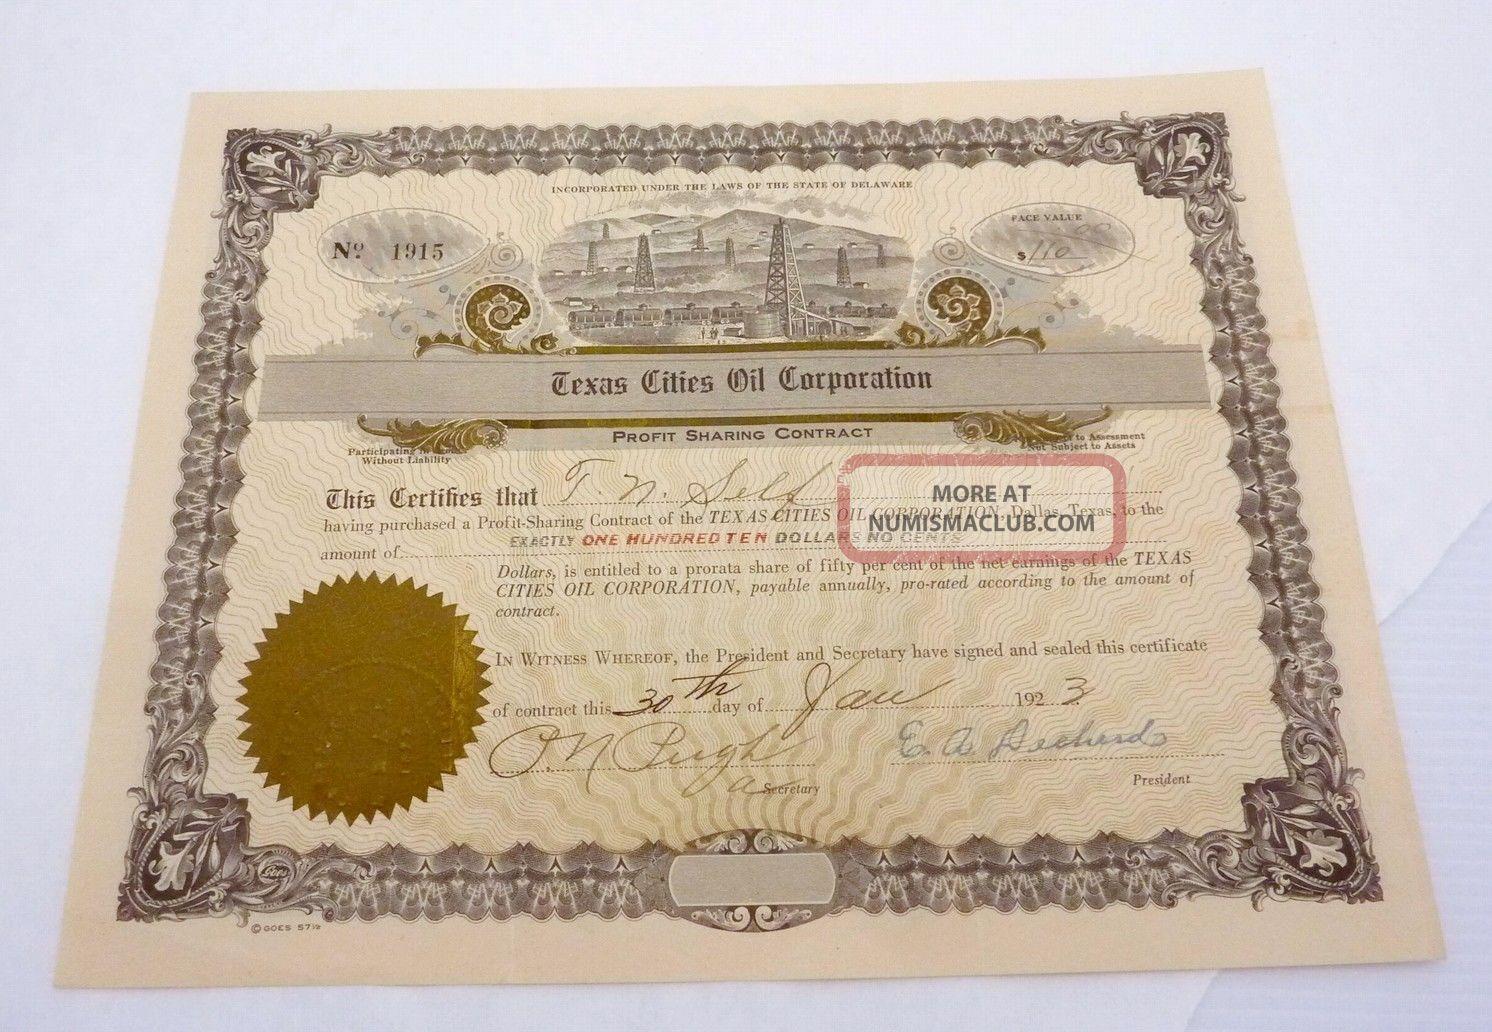 Antique 1923 Profit Sharing Contract Texas Cities Oil Corp Dallas Texas 23005 Stocks & Bonds, Scripophily photo